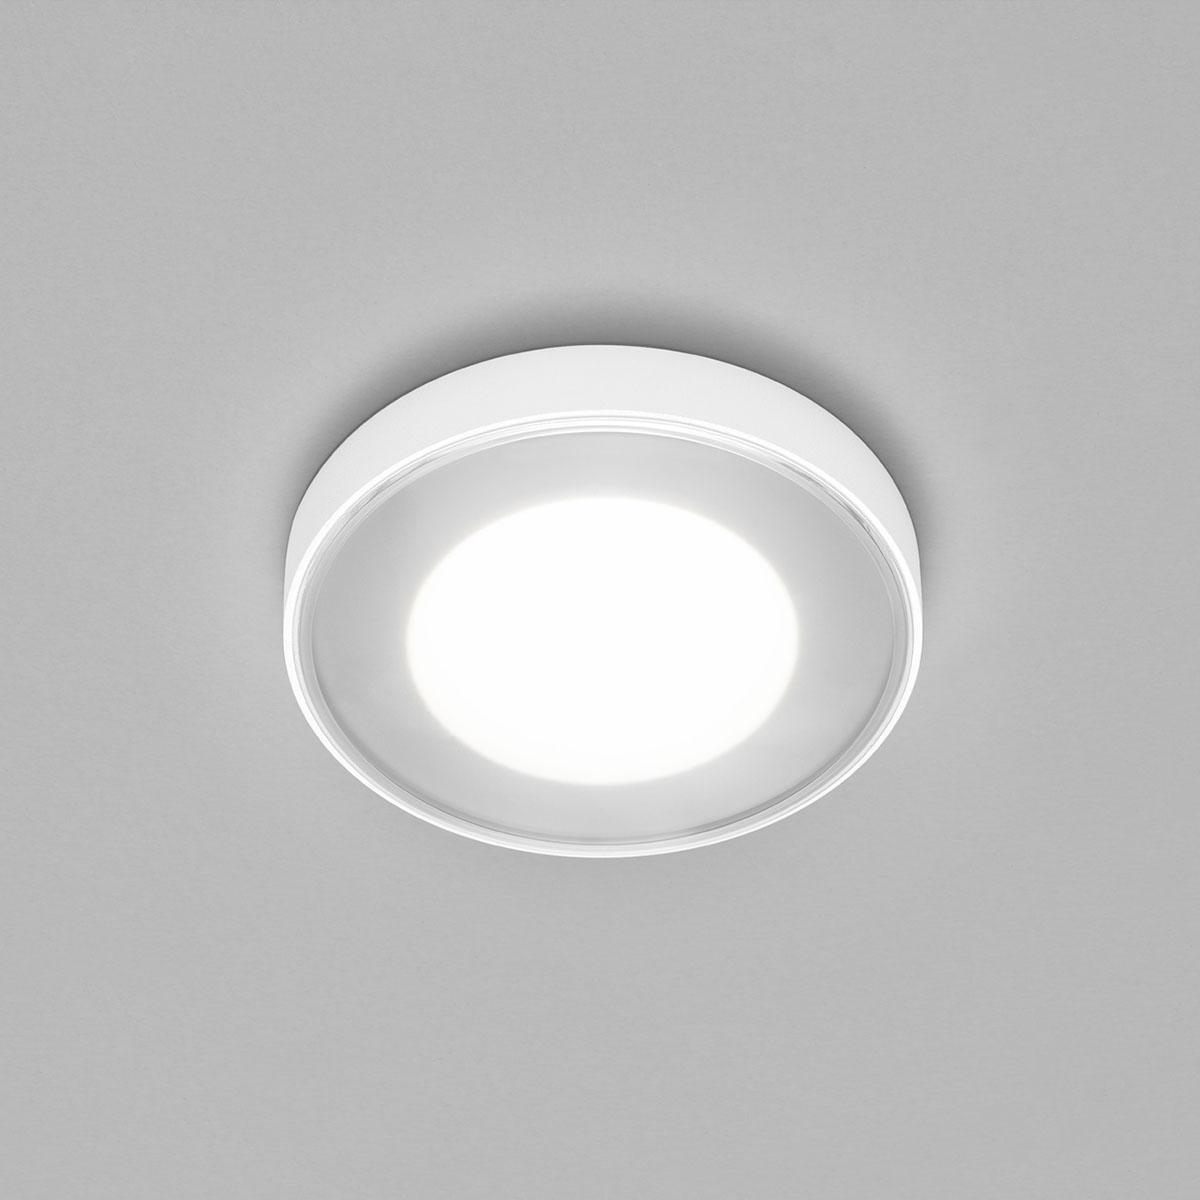 Helestra Lug LED Deckeneinbaustrahler 15/2014.07